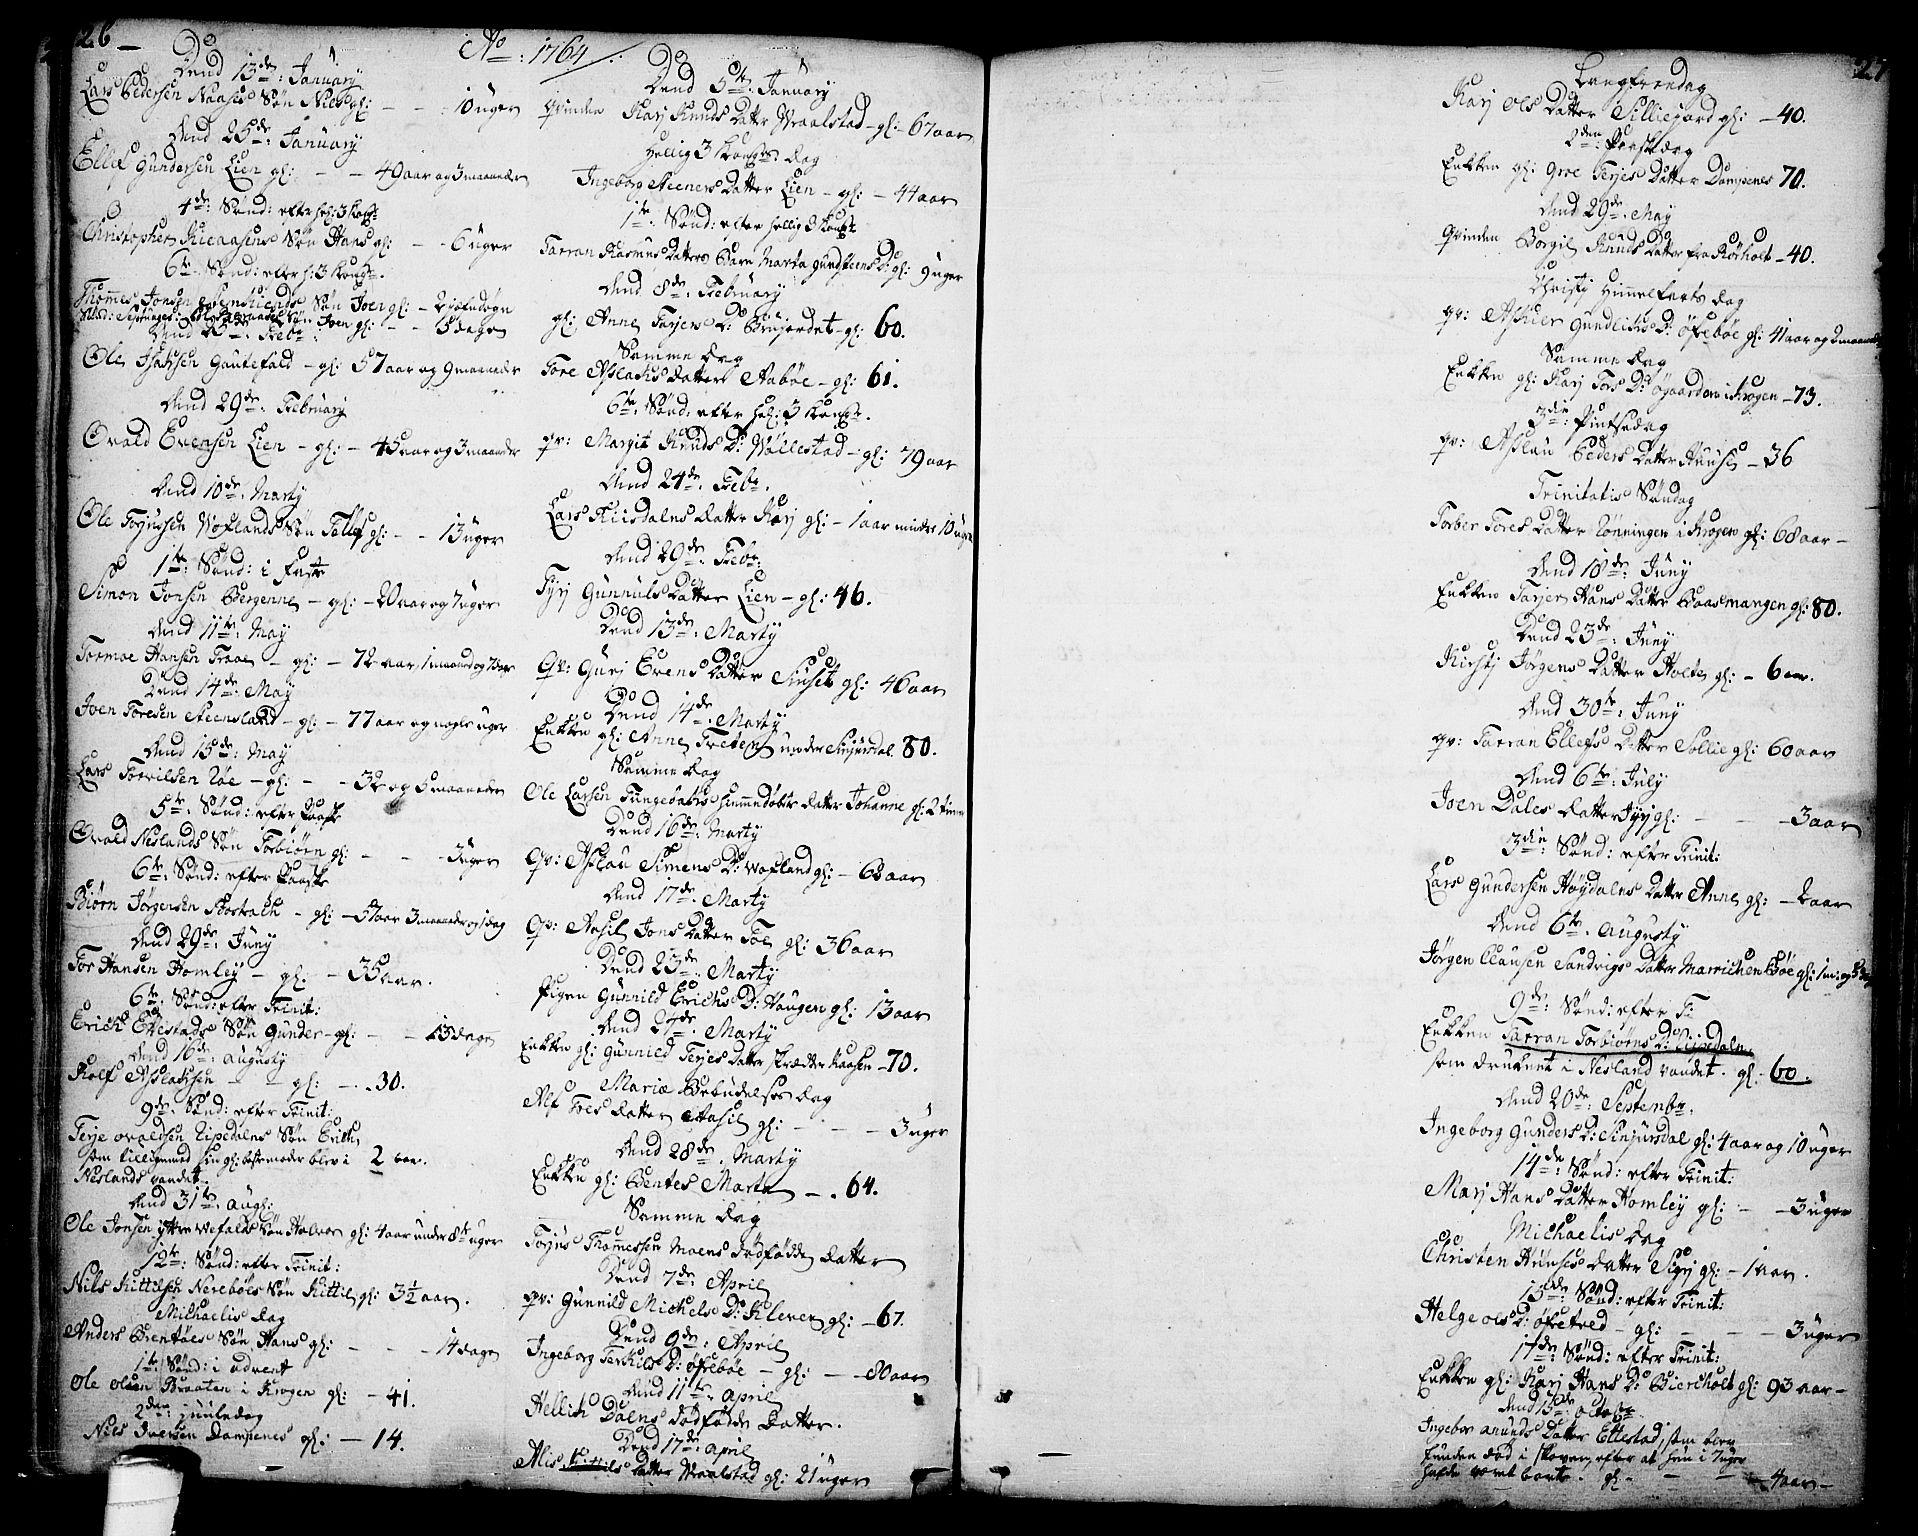 SAKO, Drangedal kirkebøker, F/Fa/L0001: Ministerialbok nr. 1, 1697-1767, s. 26-27